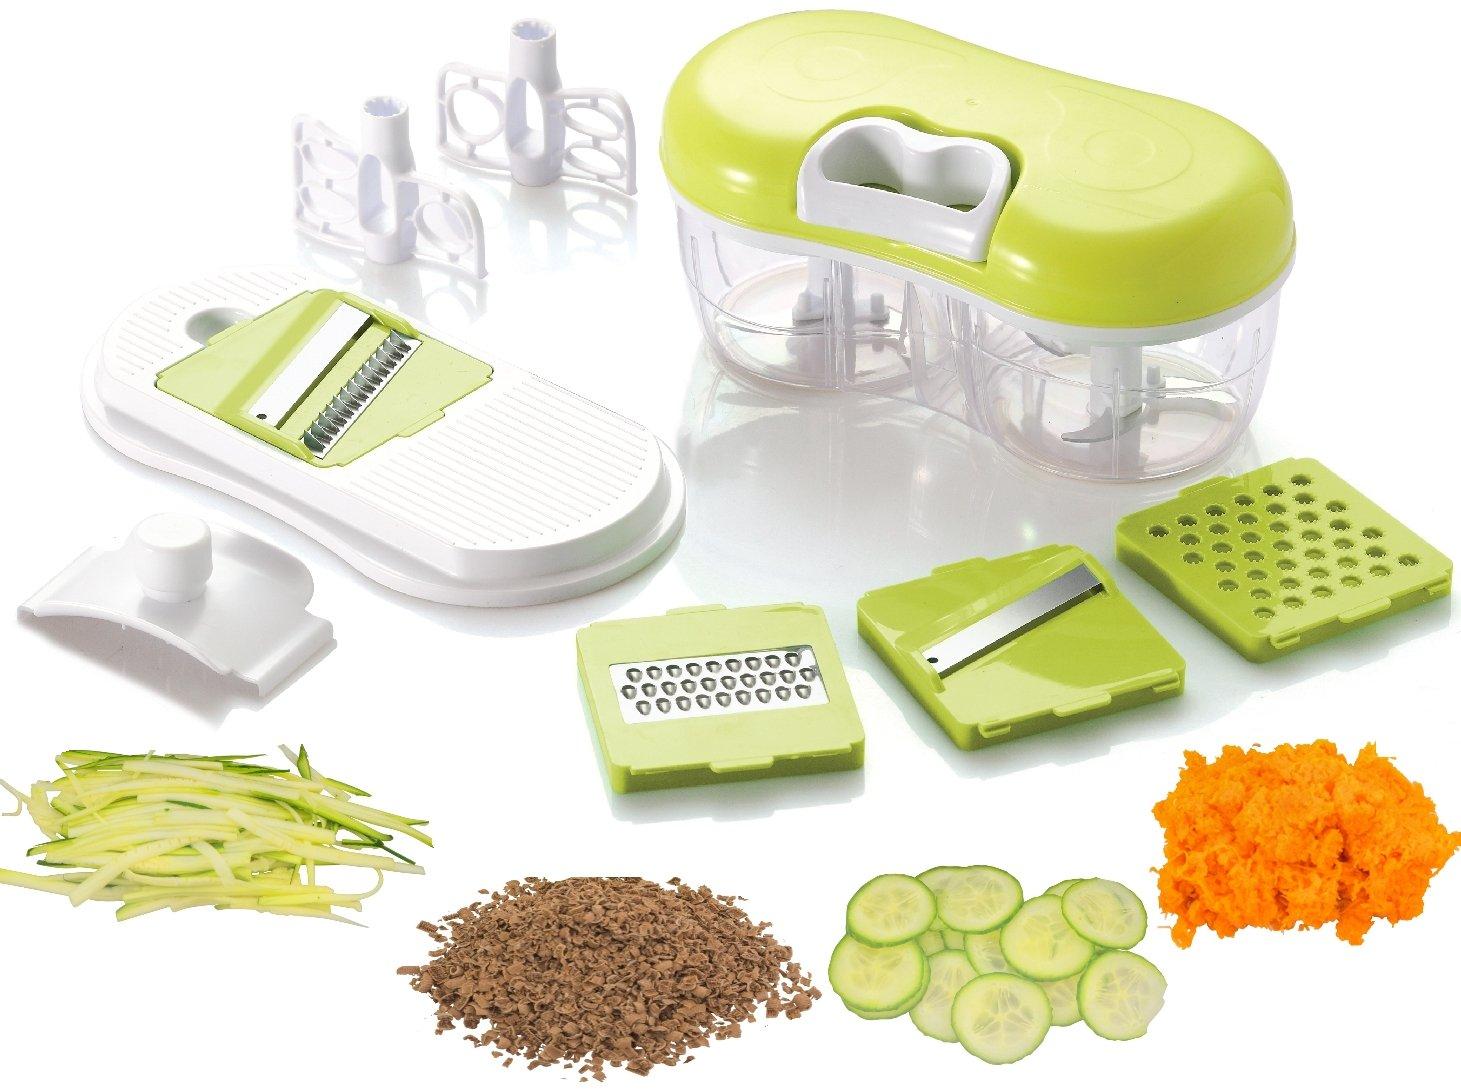 Amazon.com: Brieftons QuickPull Food Chopper: Twin Chopper / Blender ...